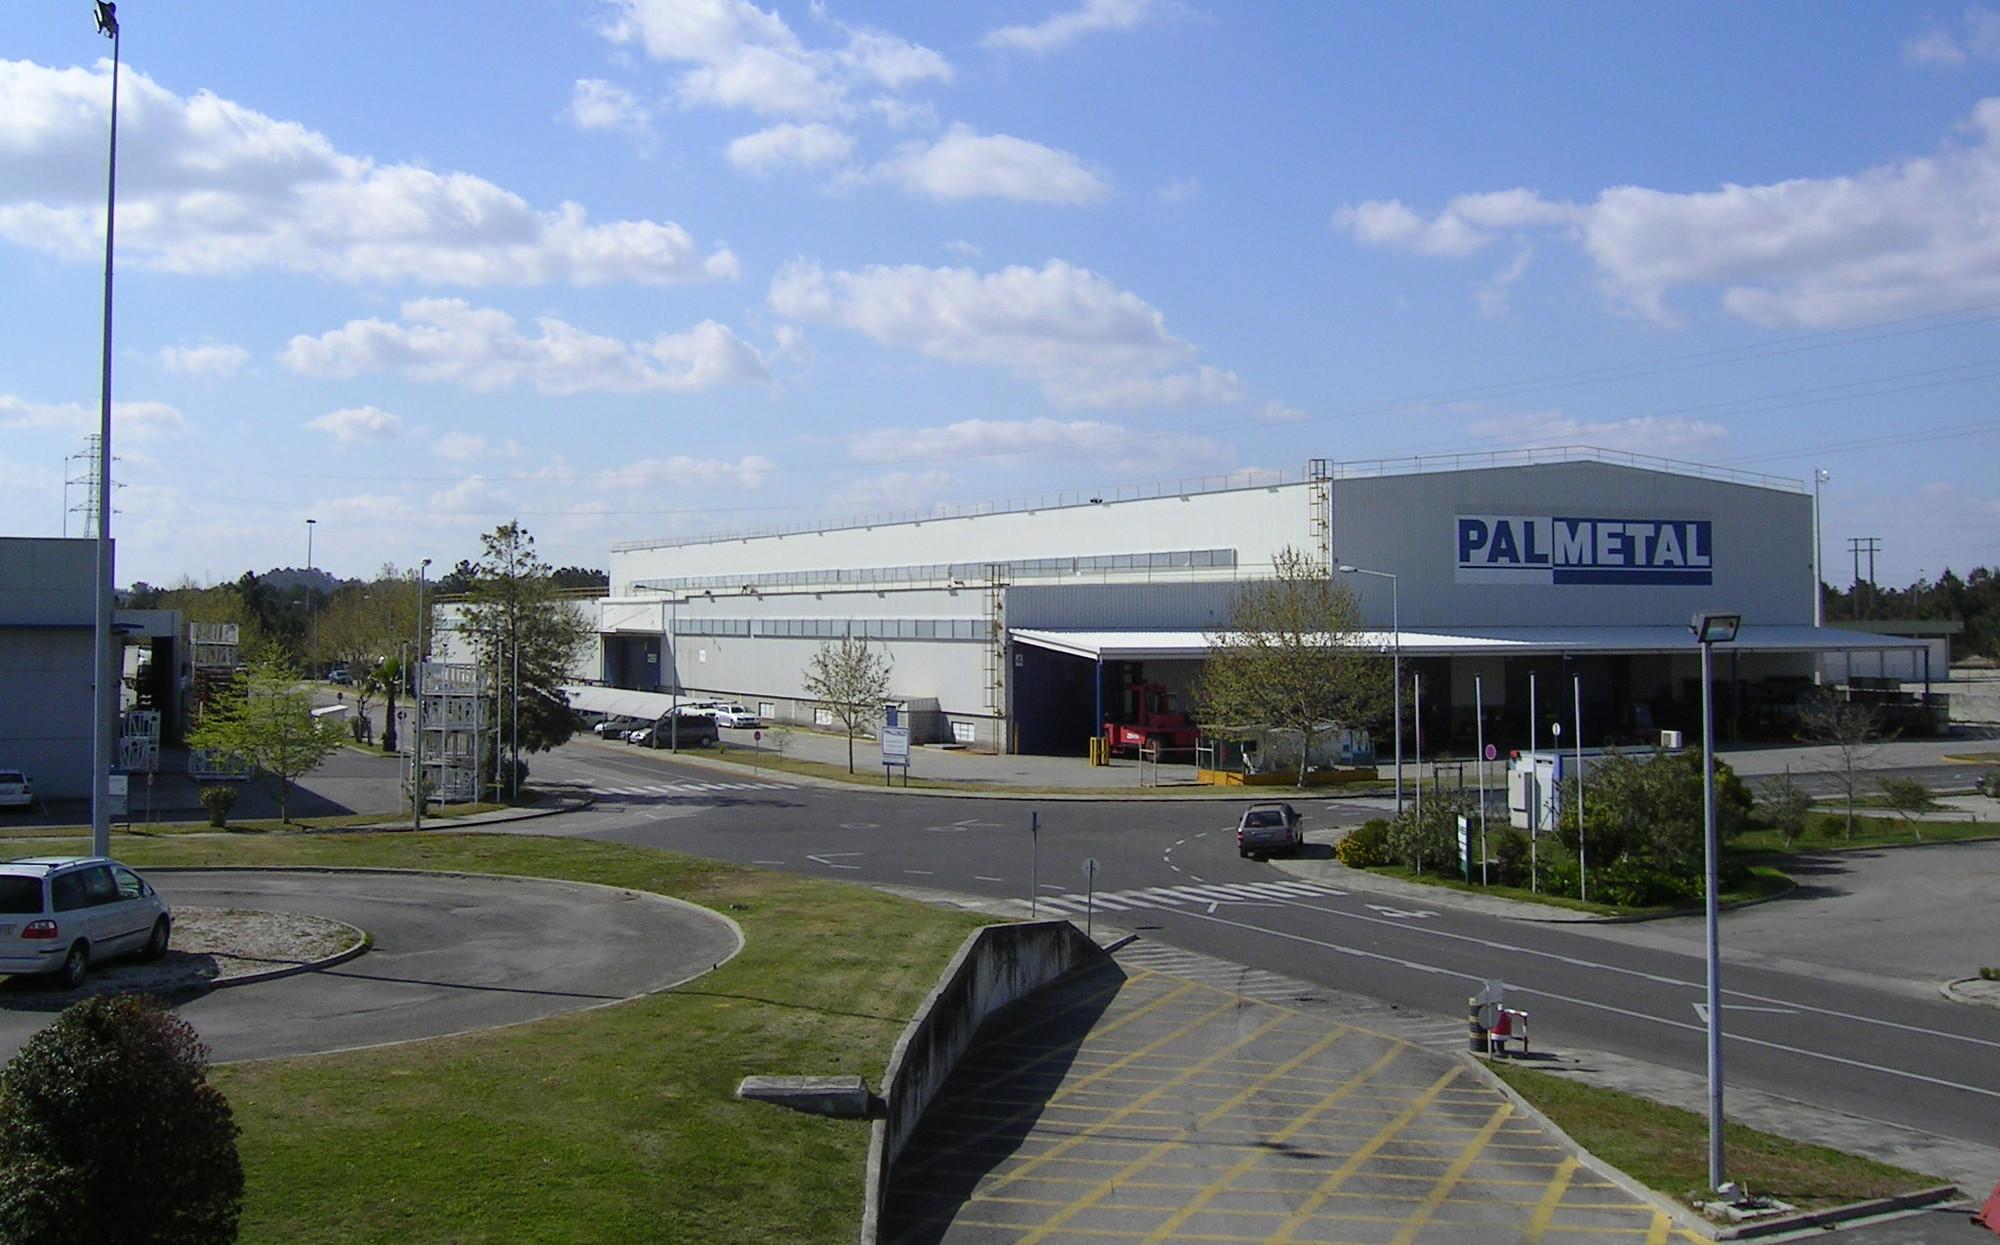 Location Palmetal